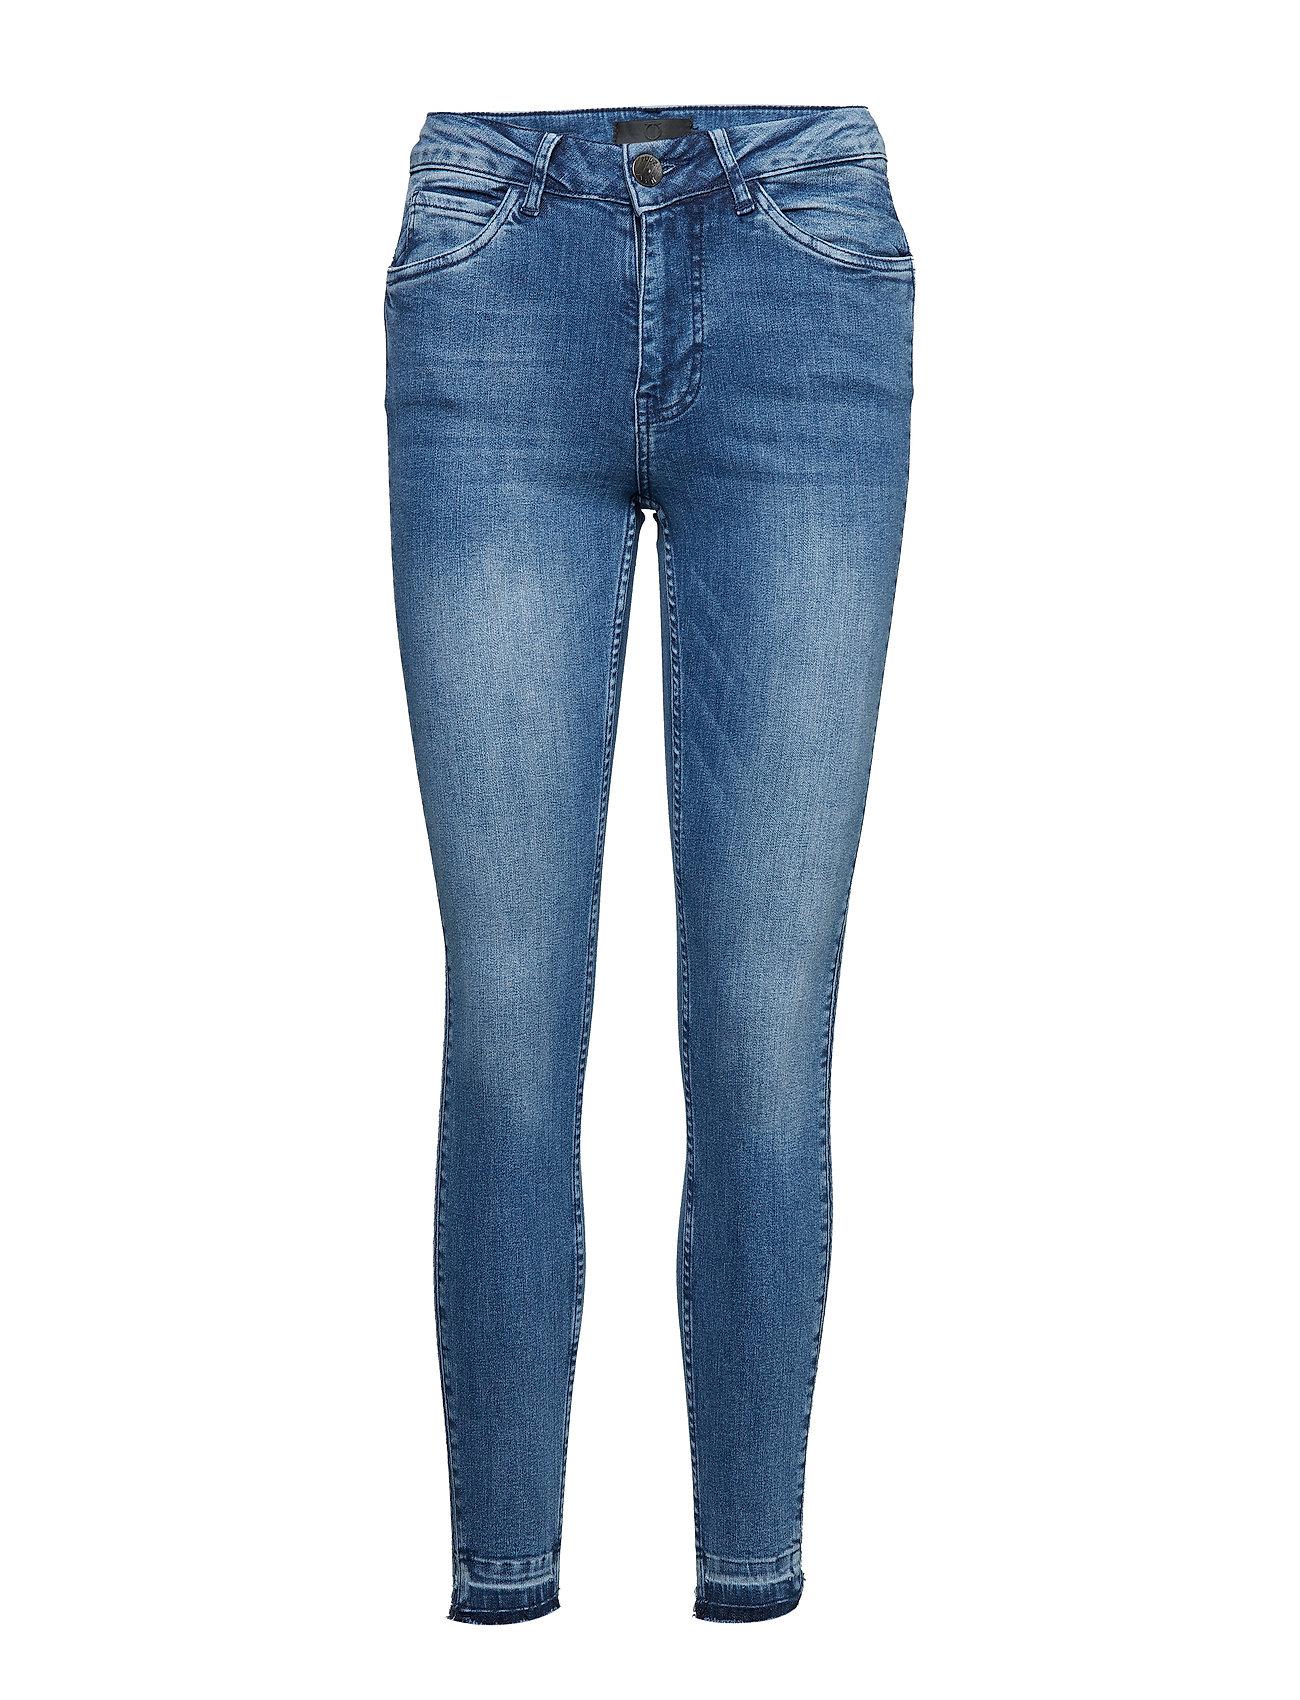 Pulz Jeans PzMiranda Highwaist Skinny - MEDIUM BLUE DENIM